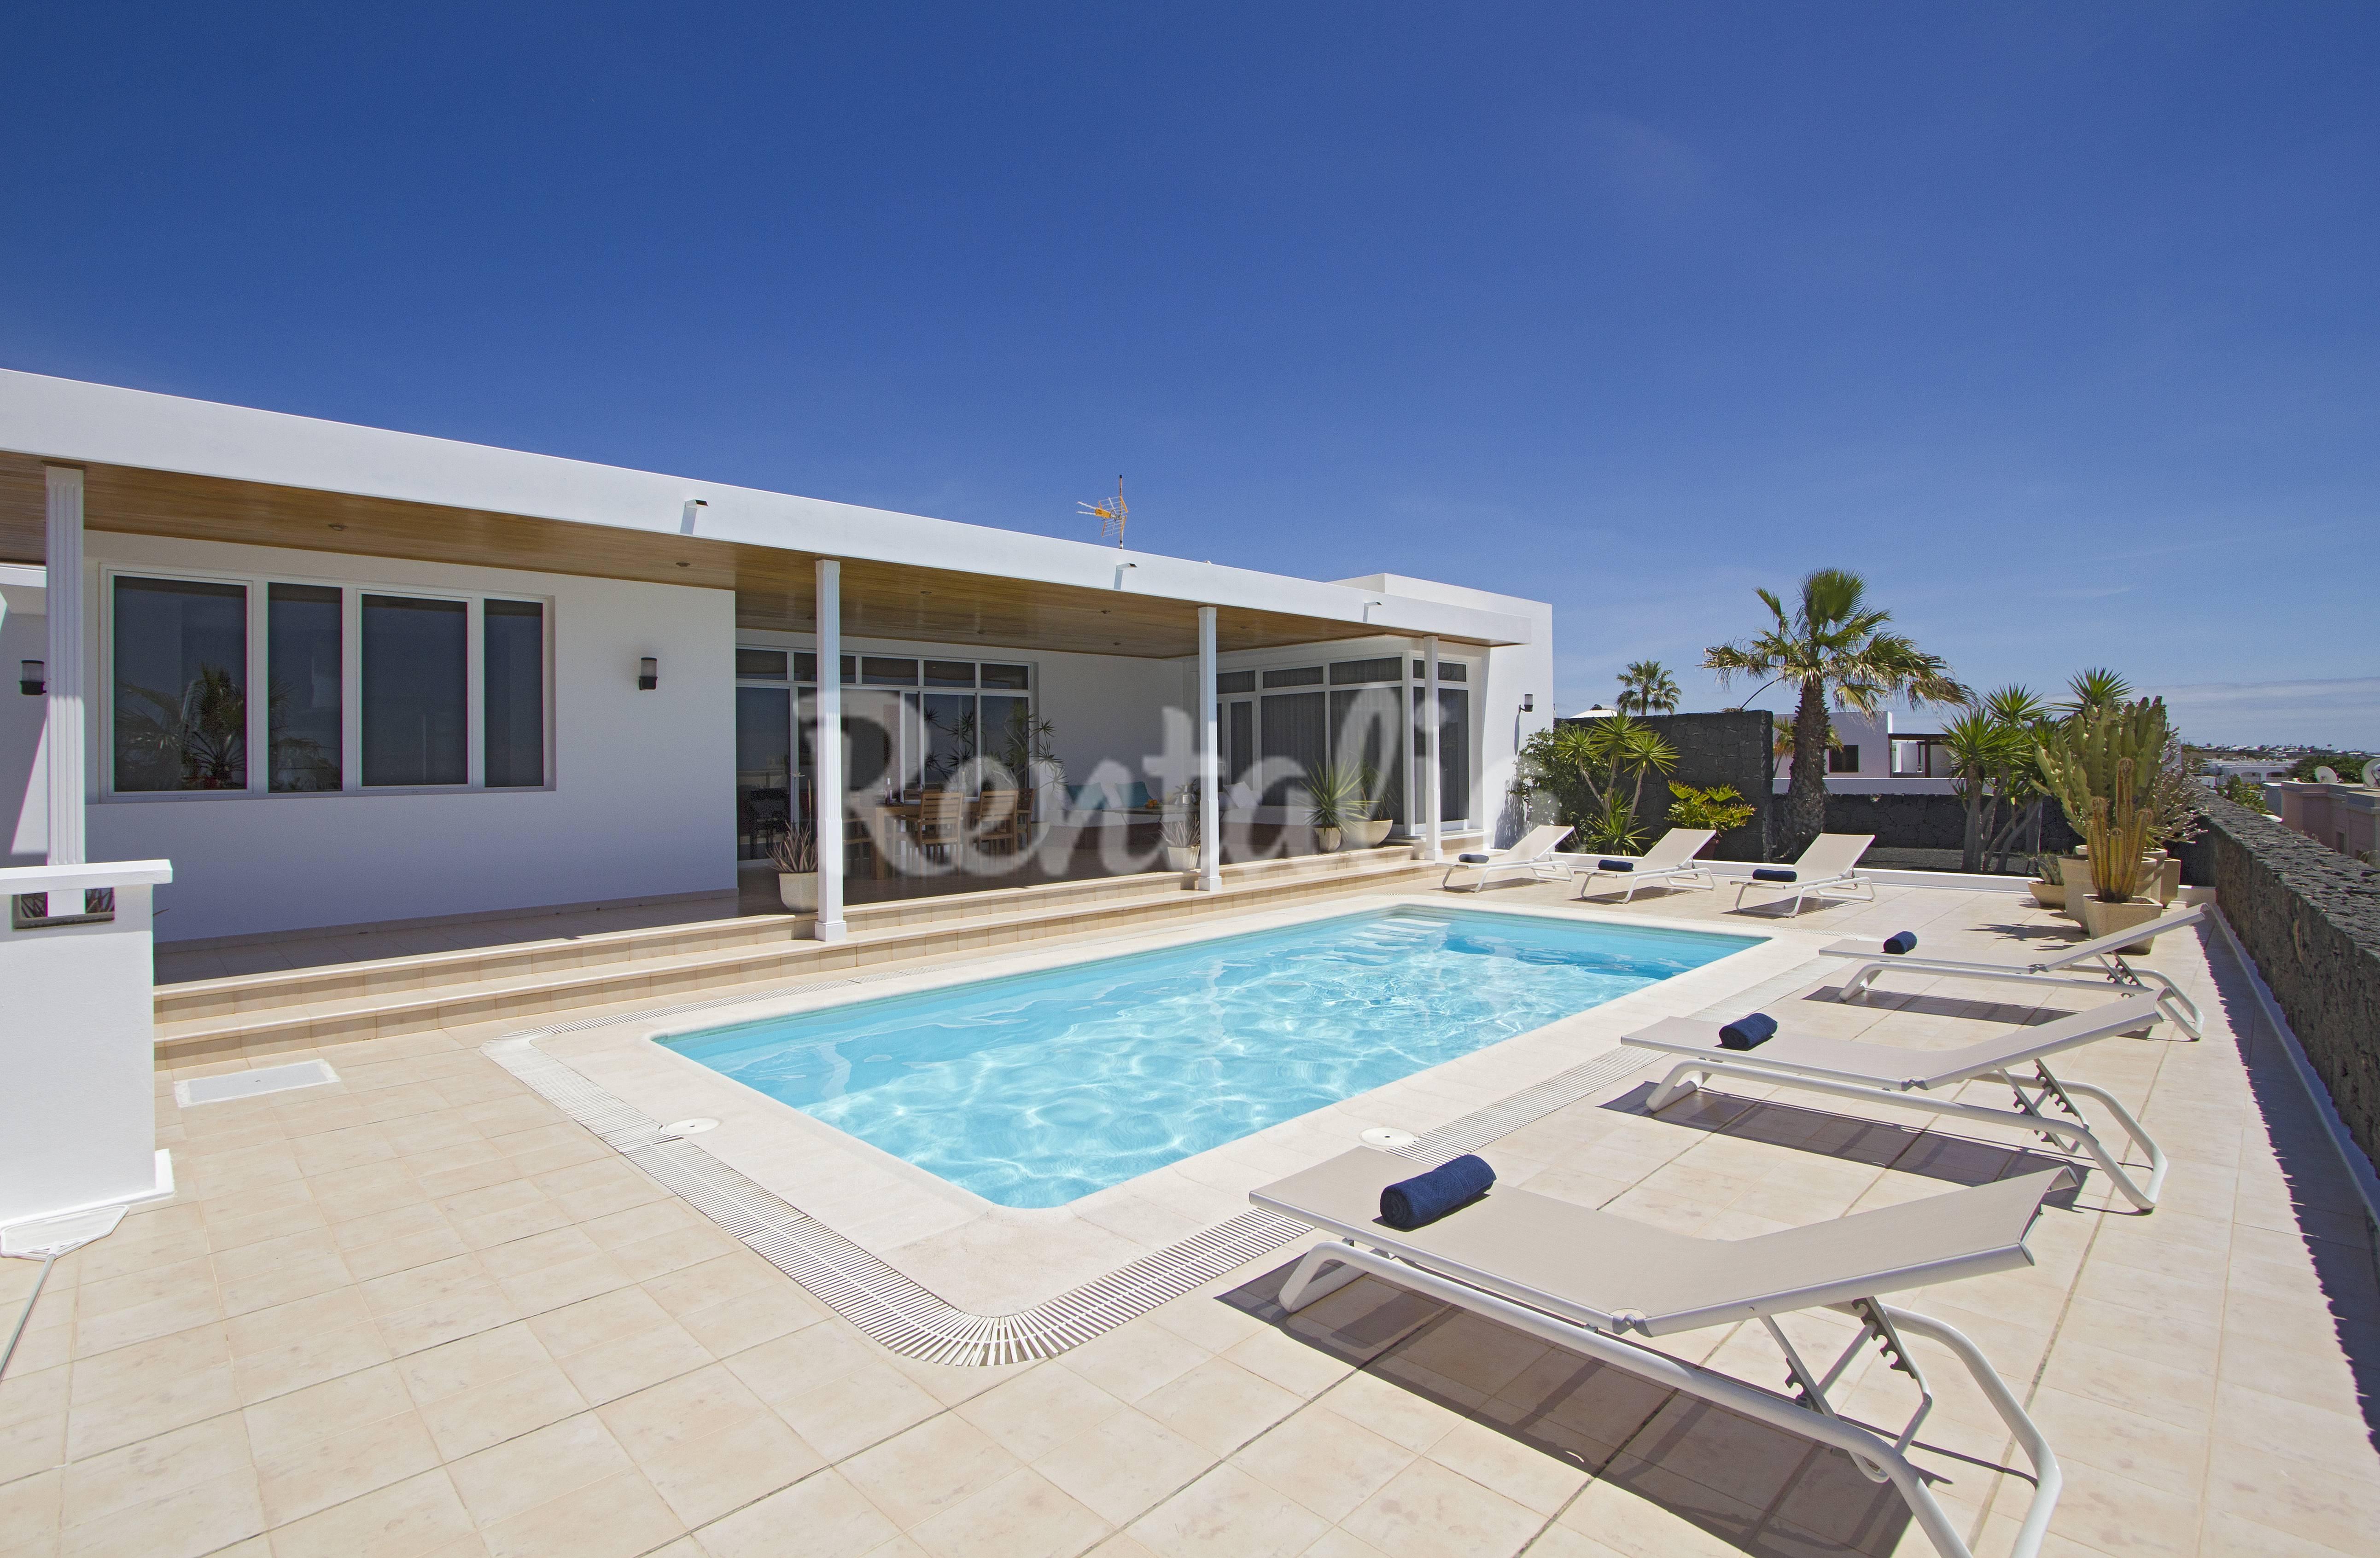 villa f r 6 personen 500 meter bis zum strand puerto. Black Bedroom Furniture Sets. Home Design Ideas